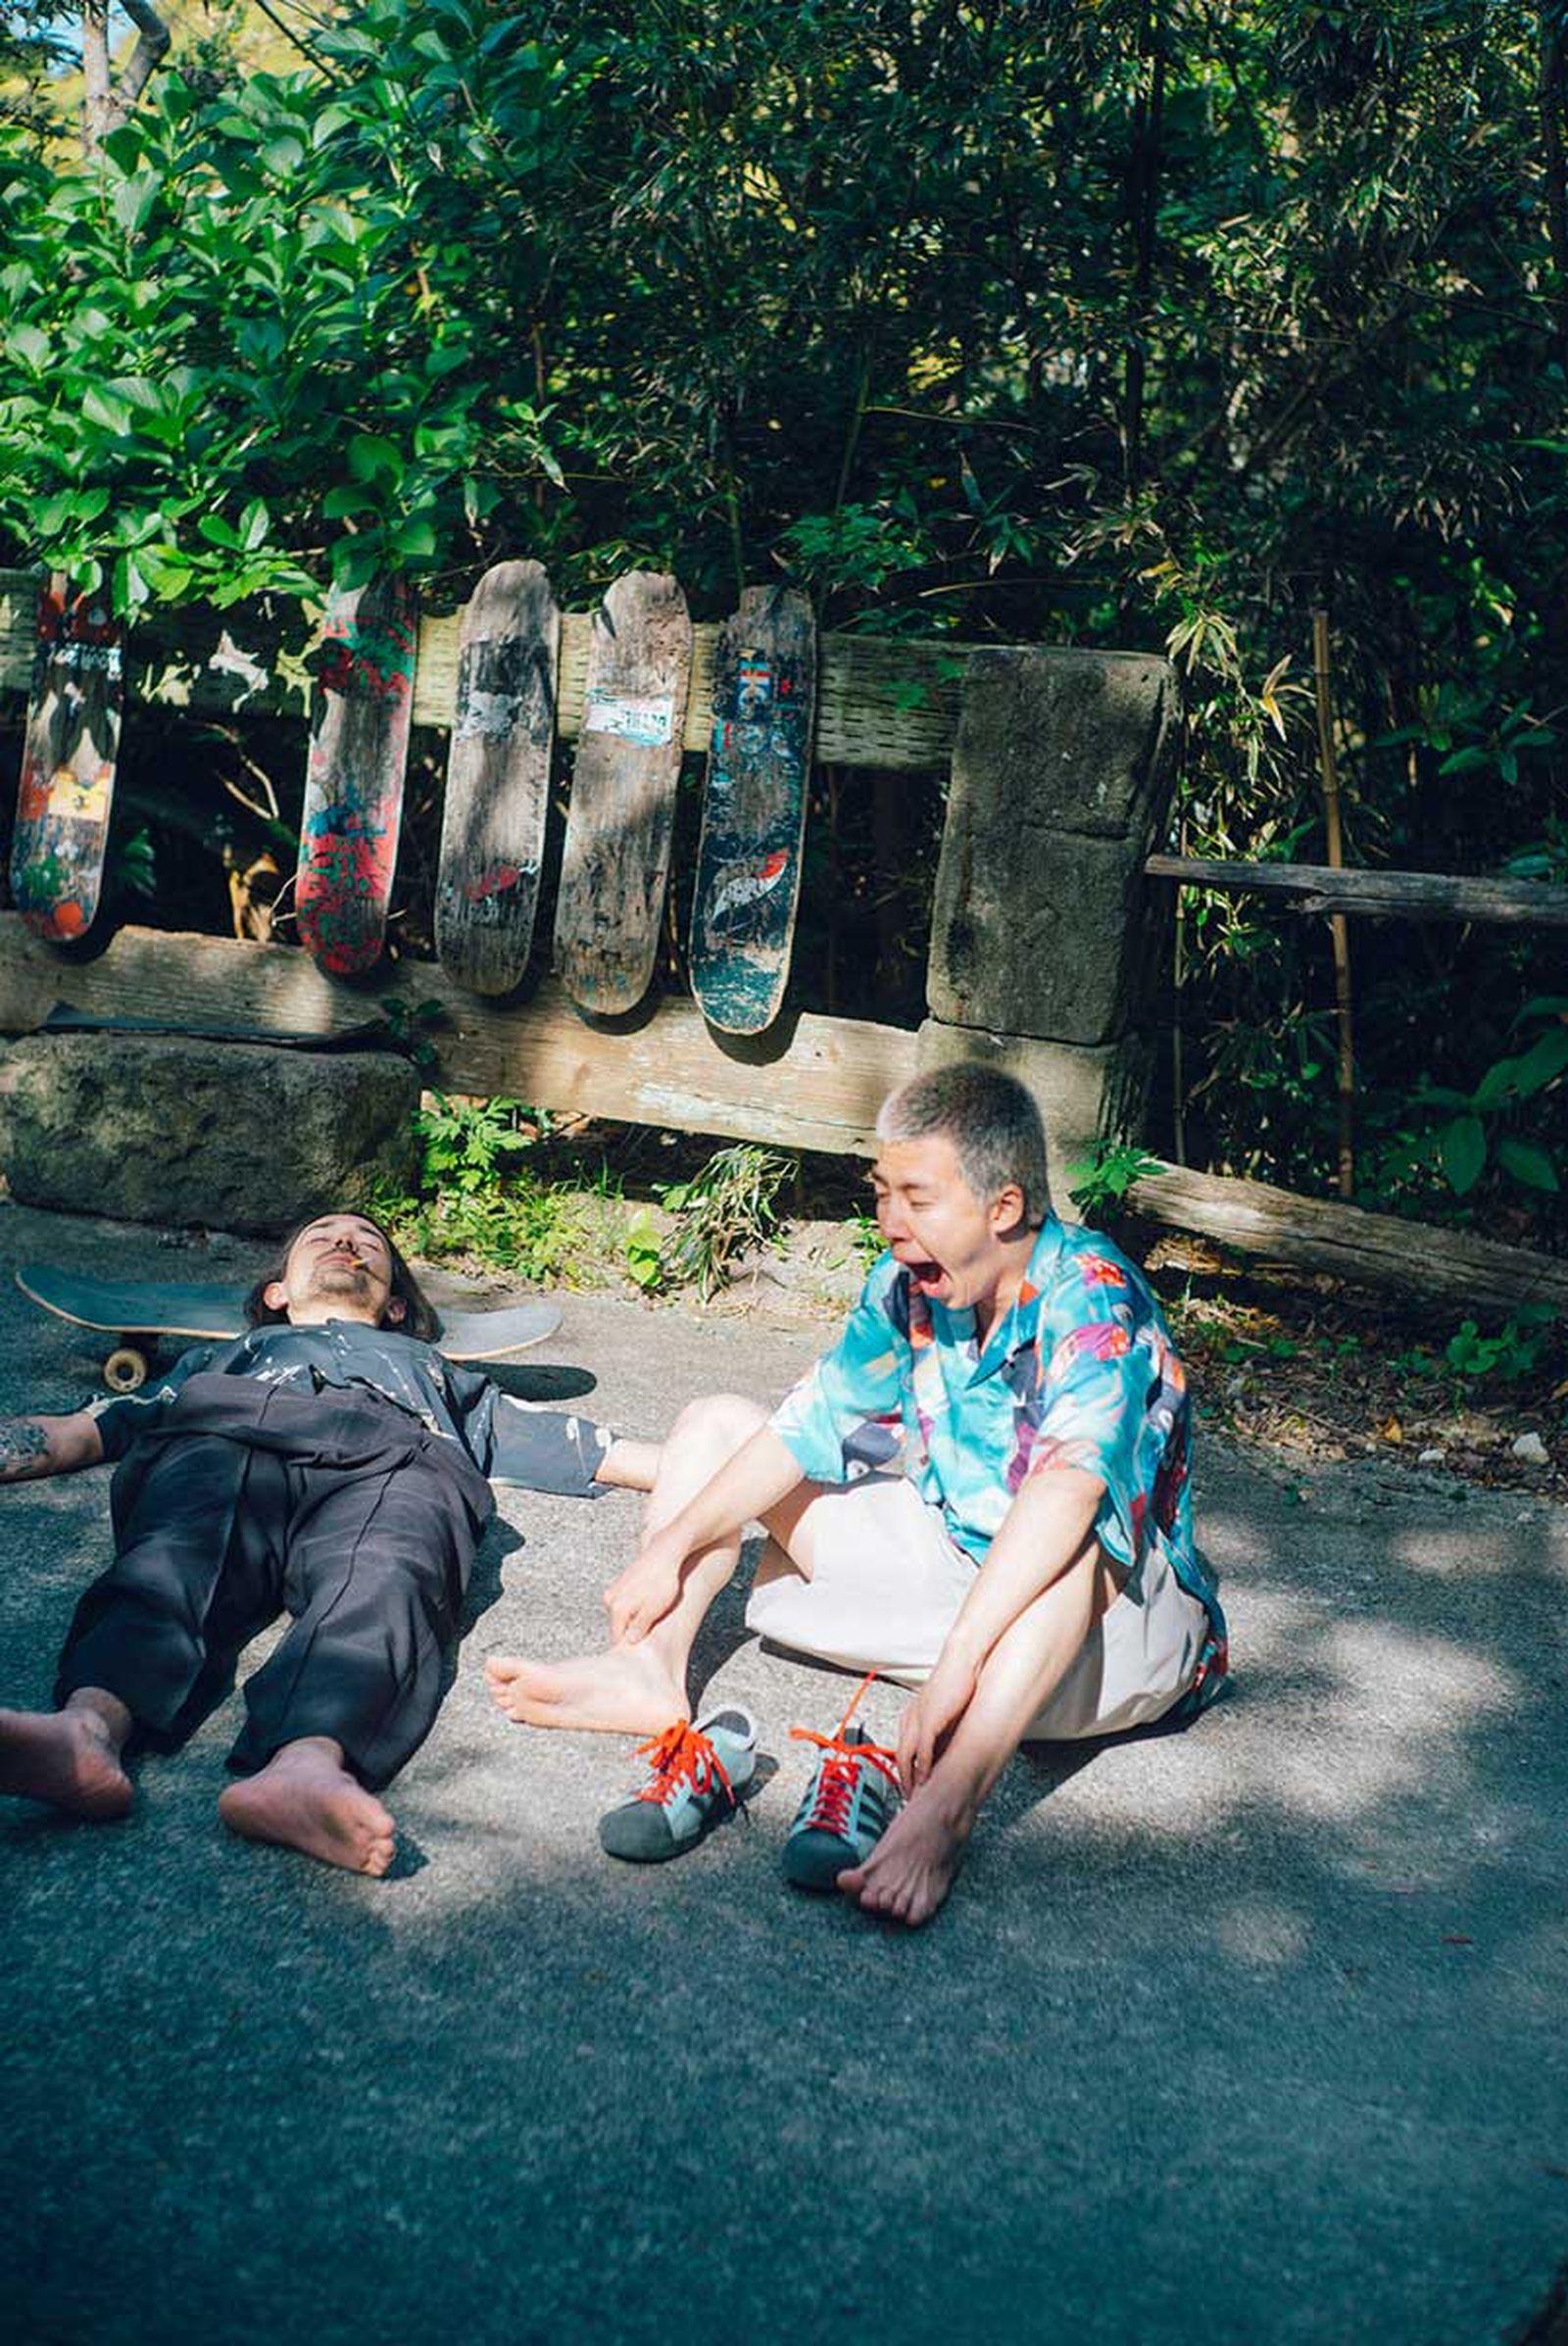 evisen-skateboards-summer-2021-(14)